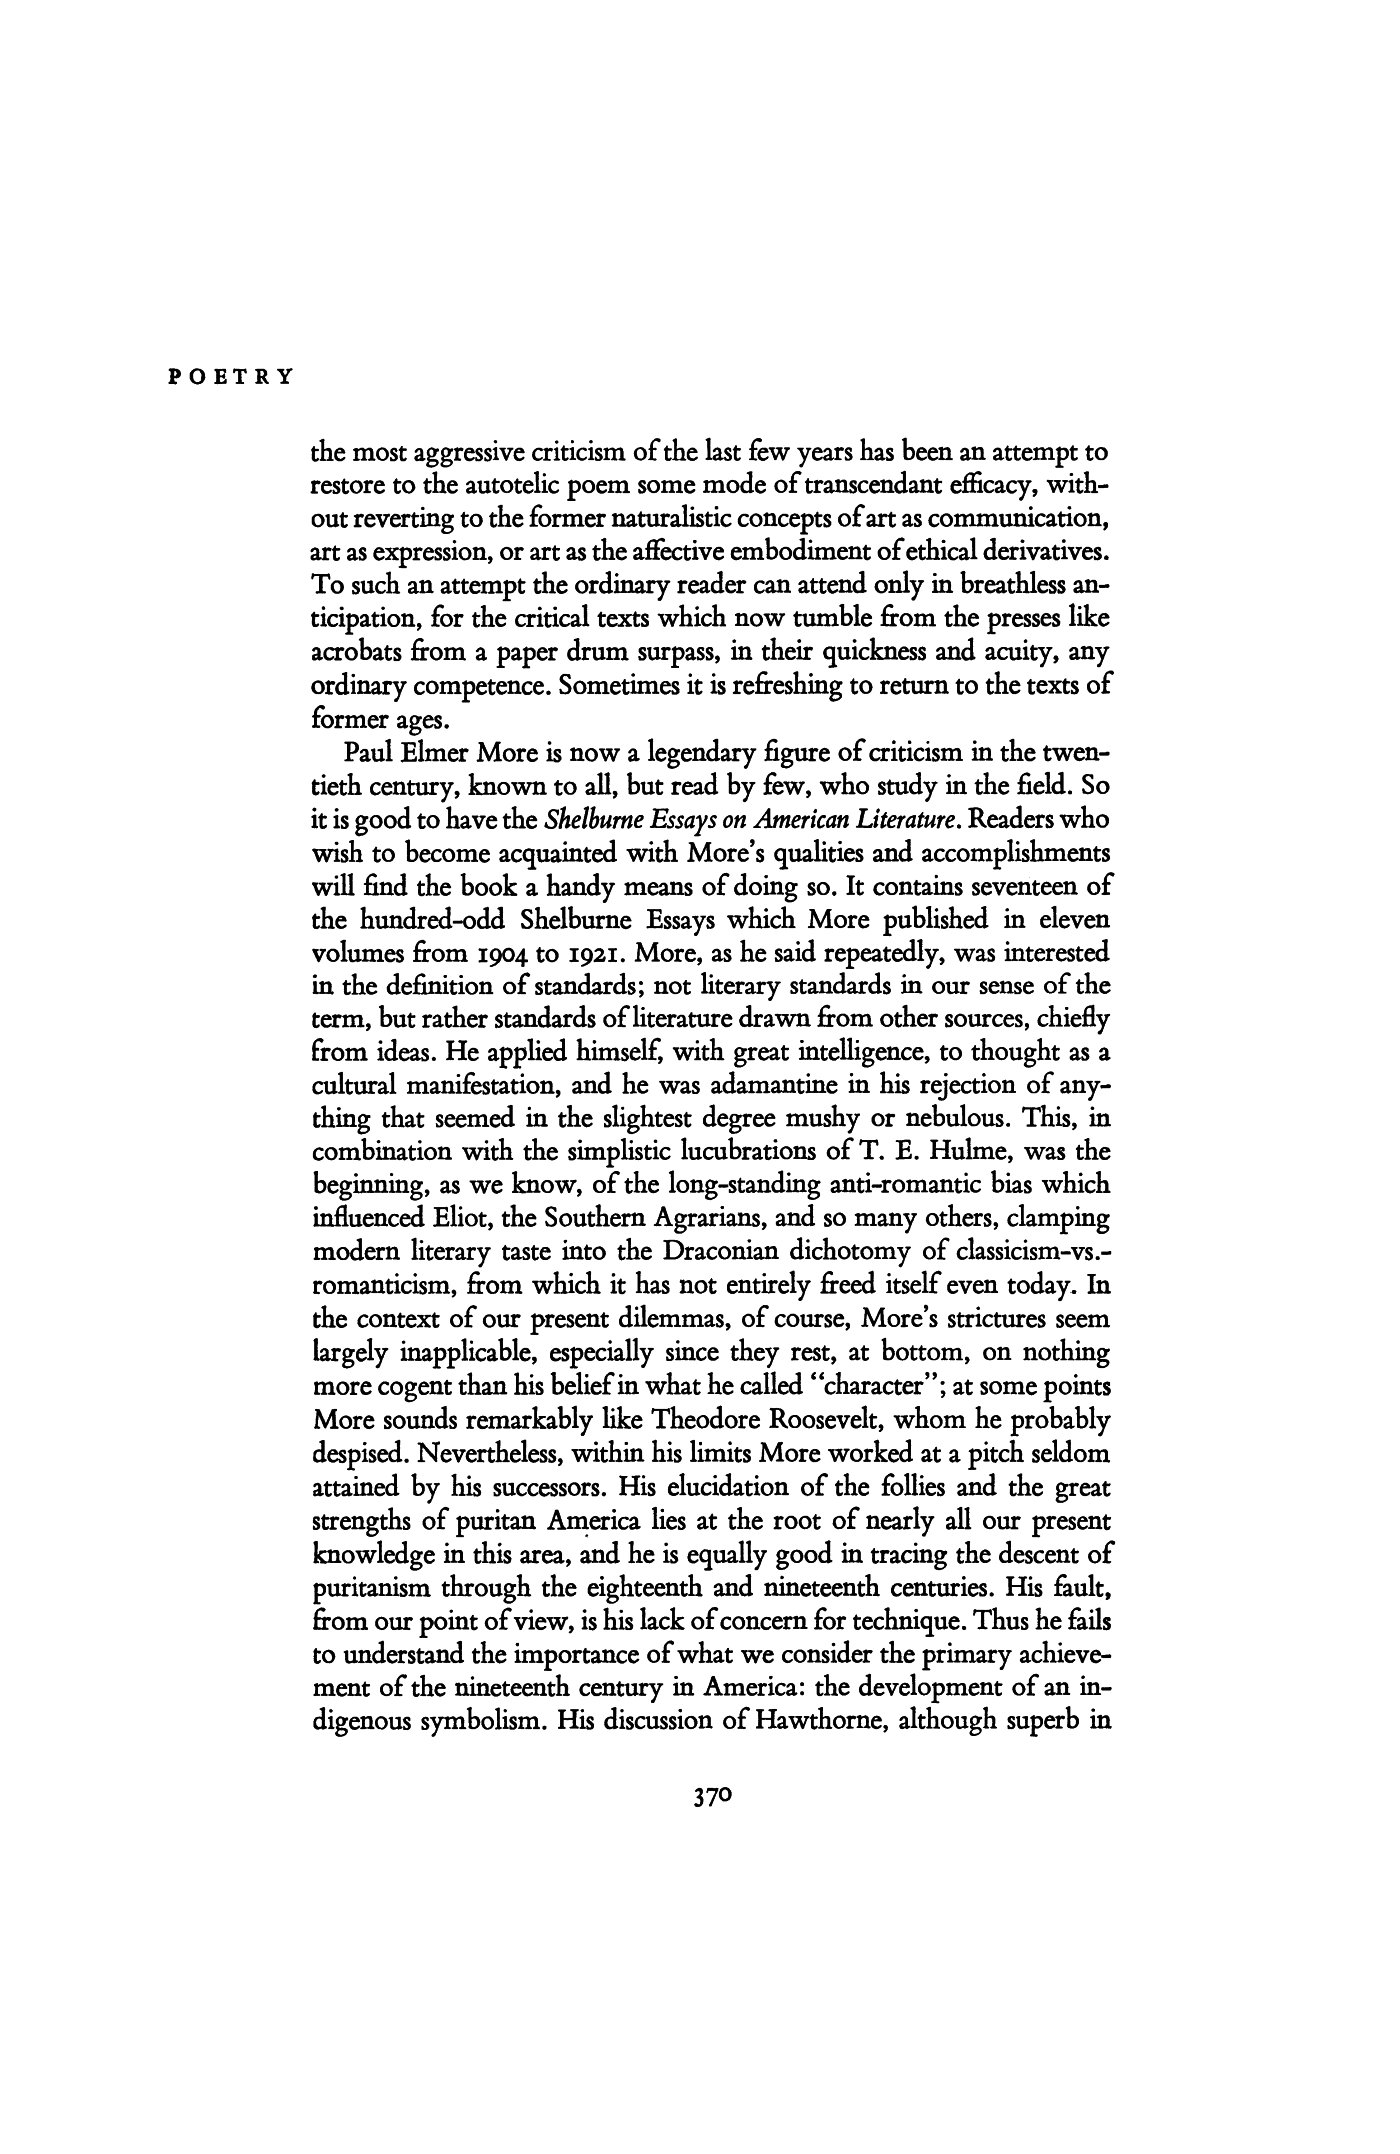 essays on poetic theory